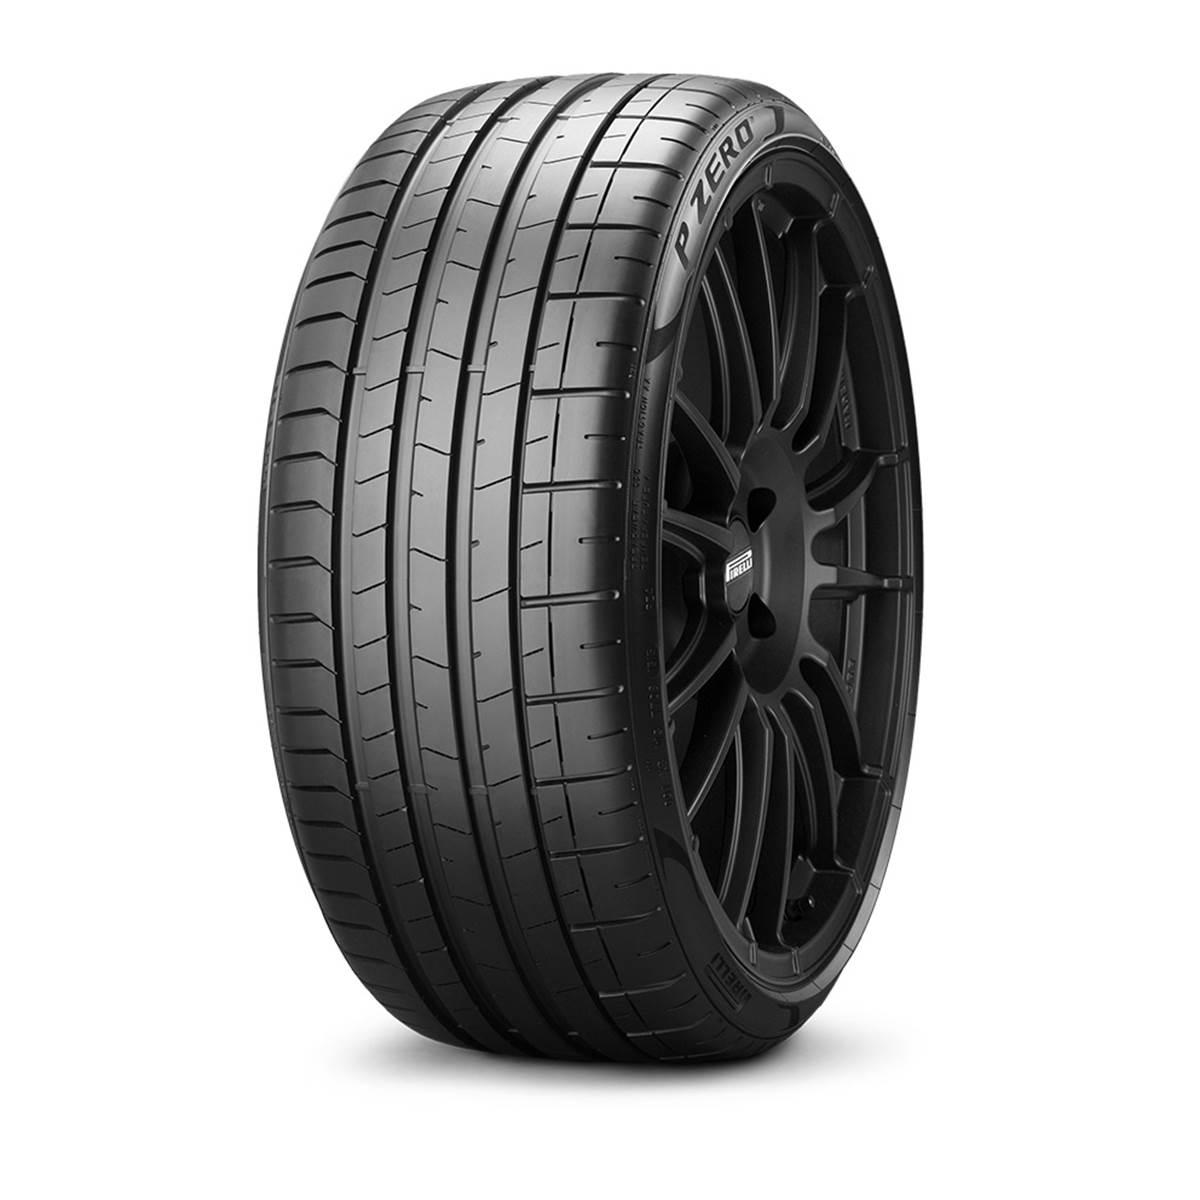 Pirelli P Zero Homologue Jaguar Xl